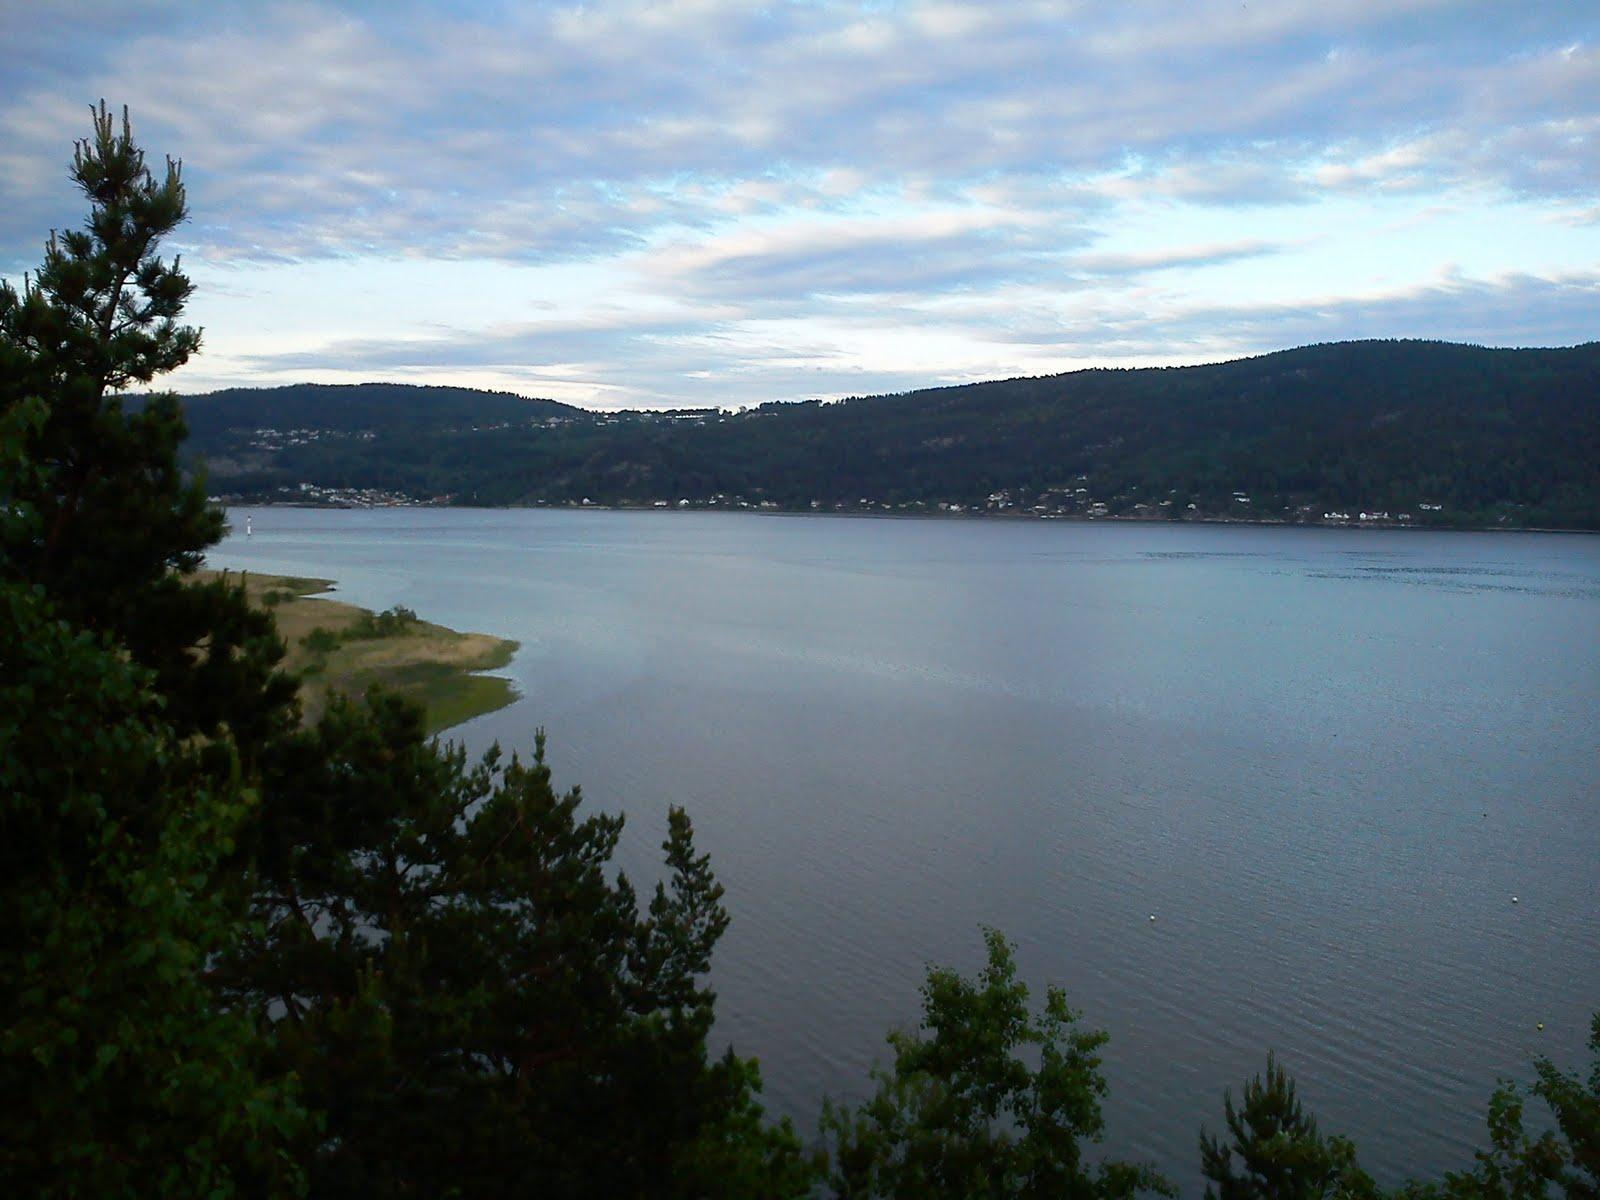 blogg om trening Svelvik